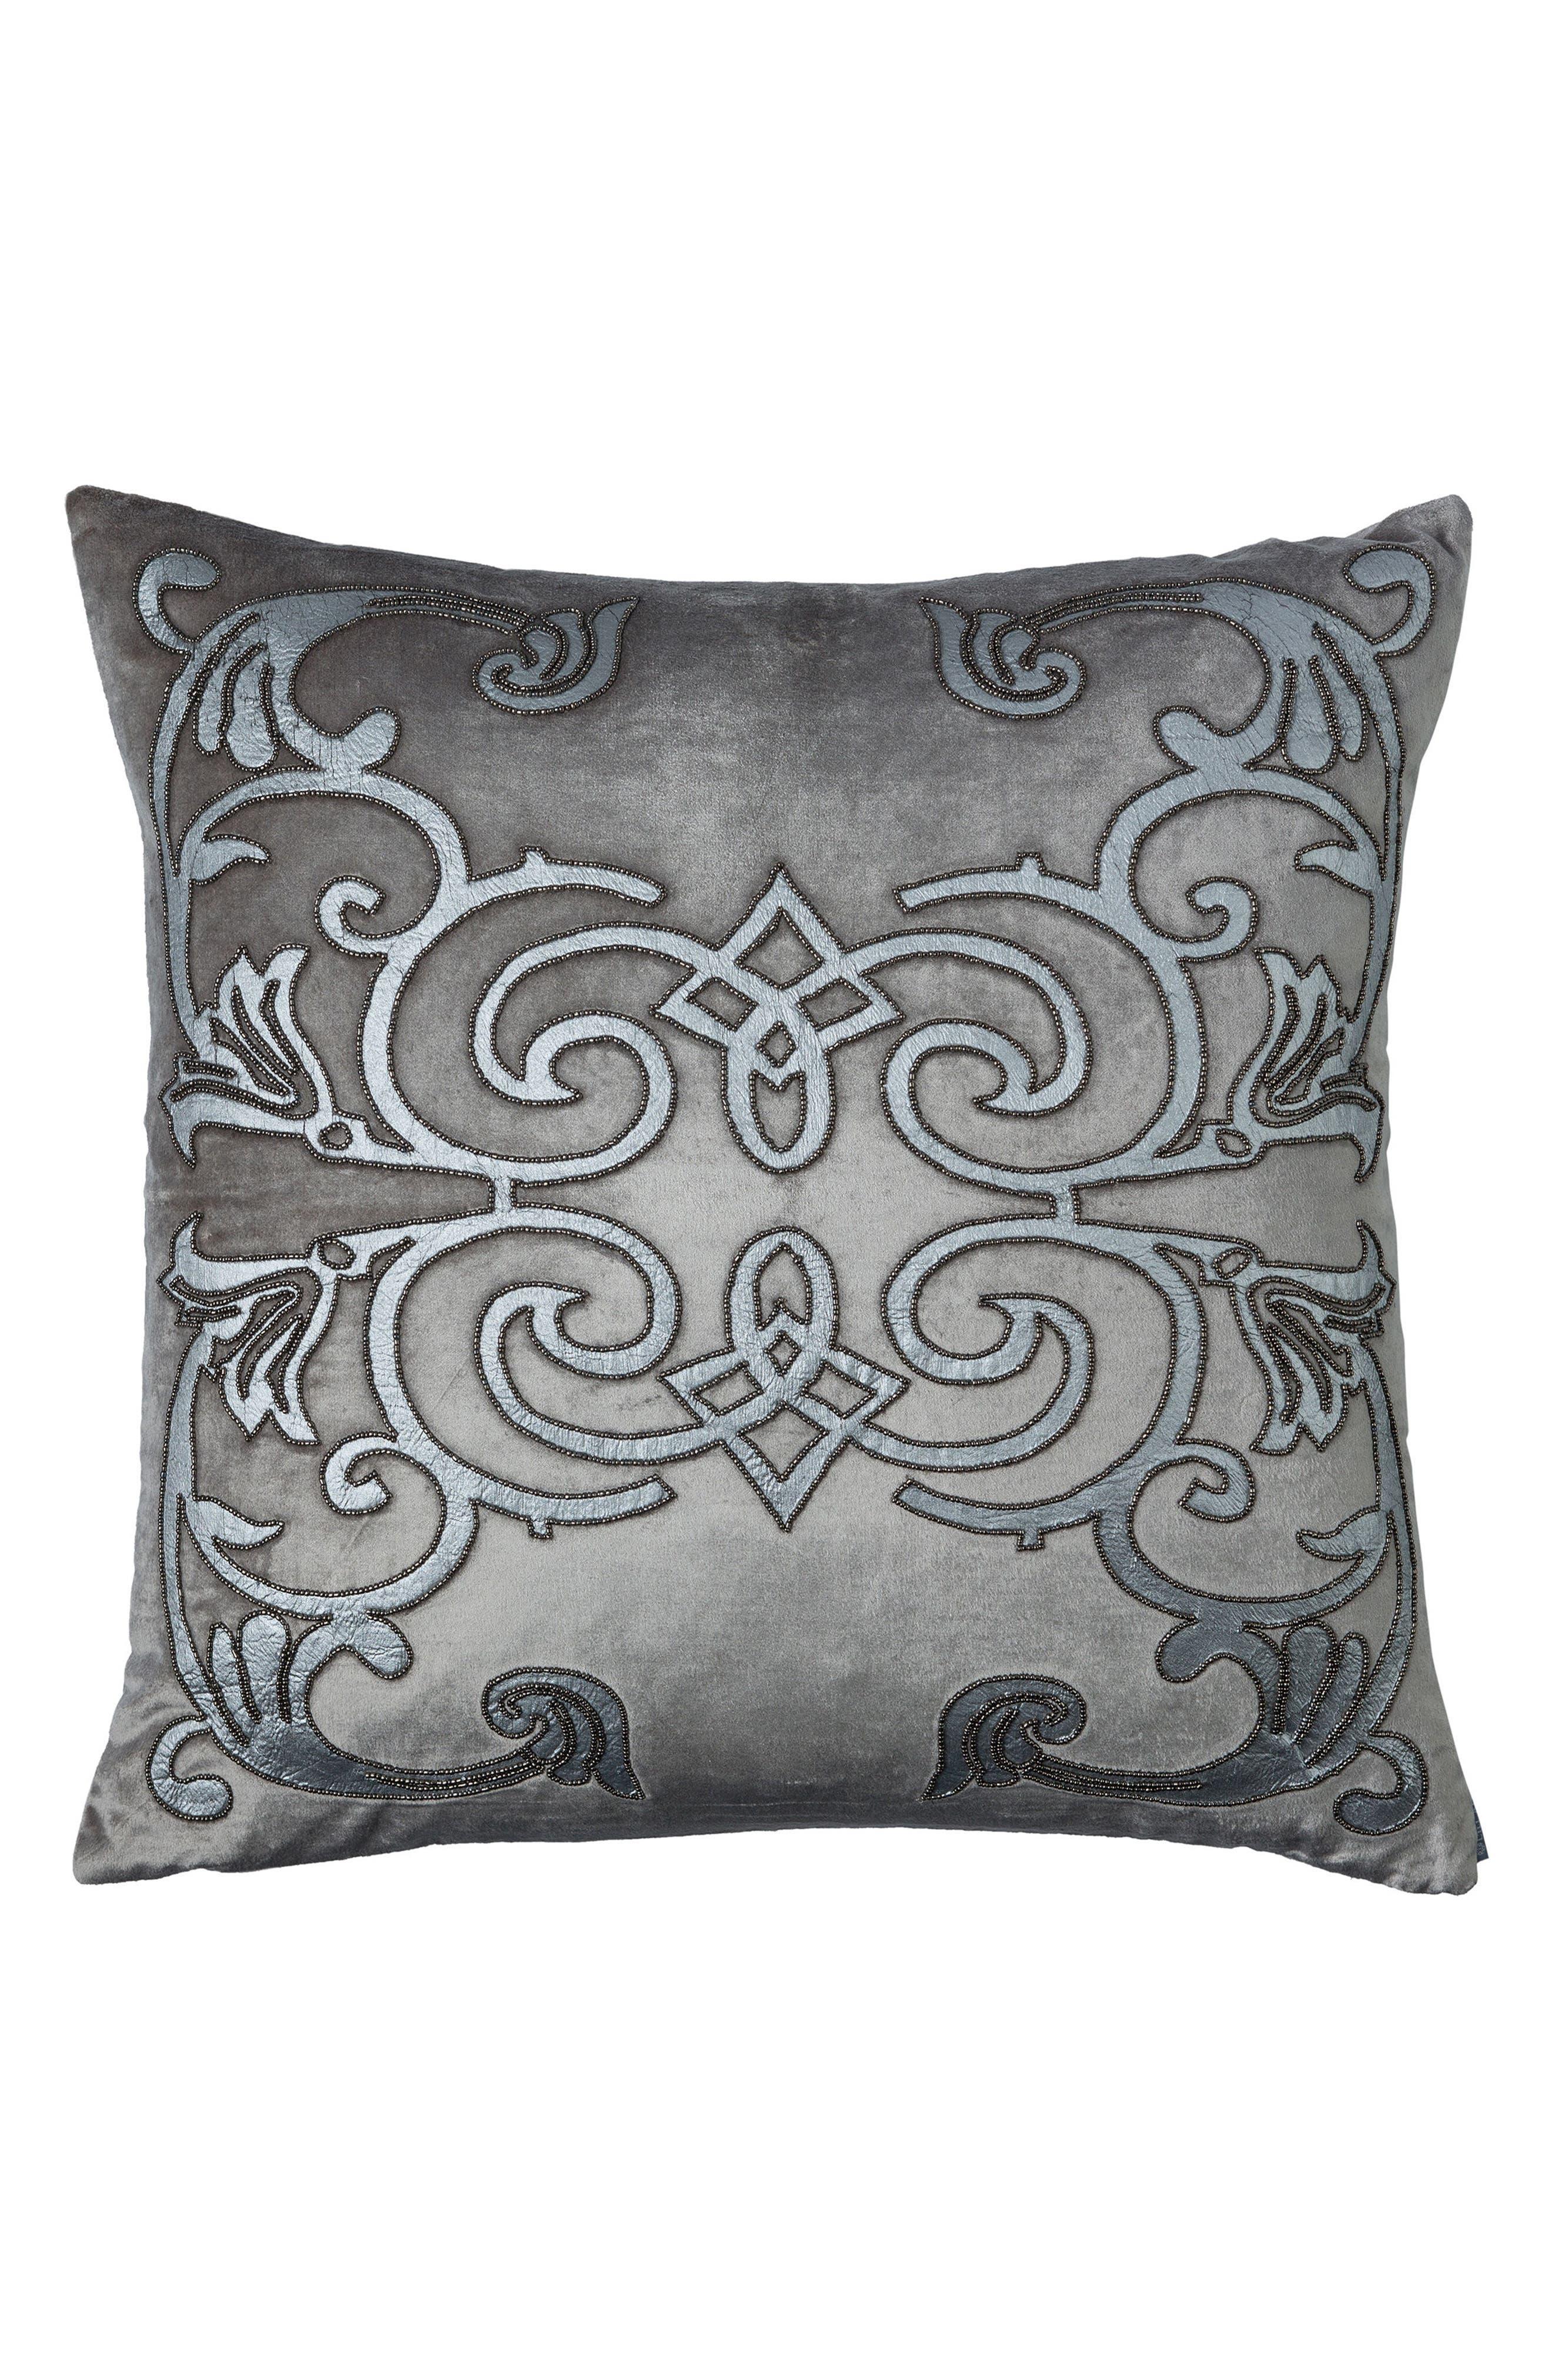 Lili Alessandra Mozart Square Accent Pillow